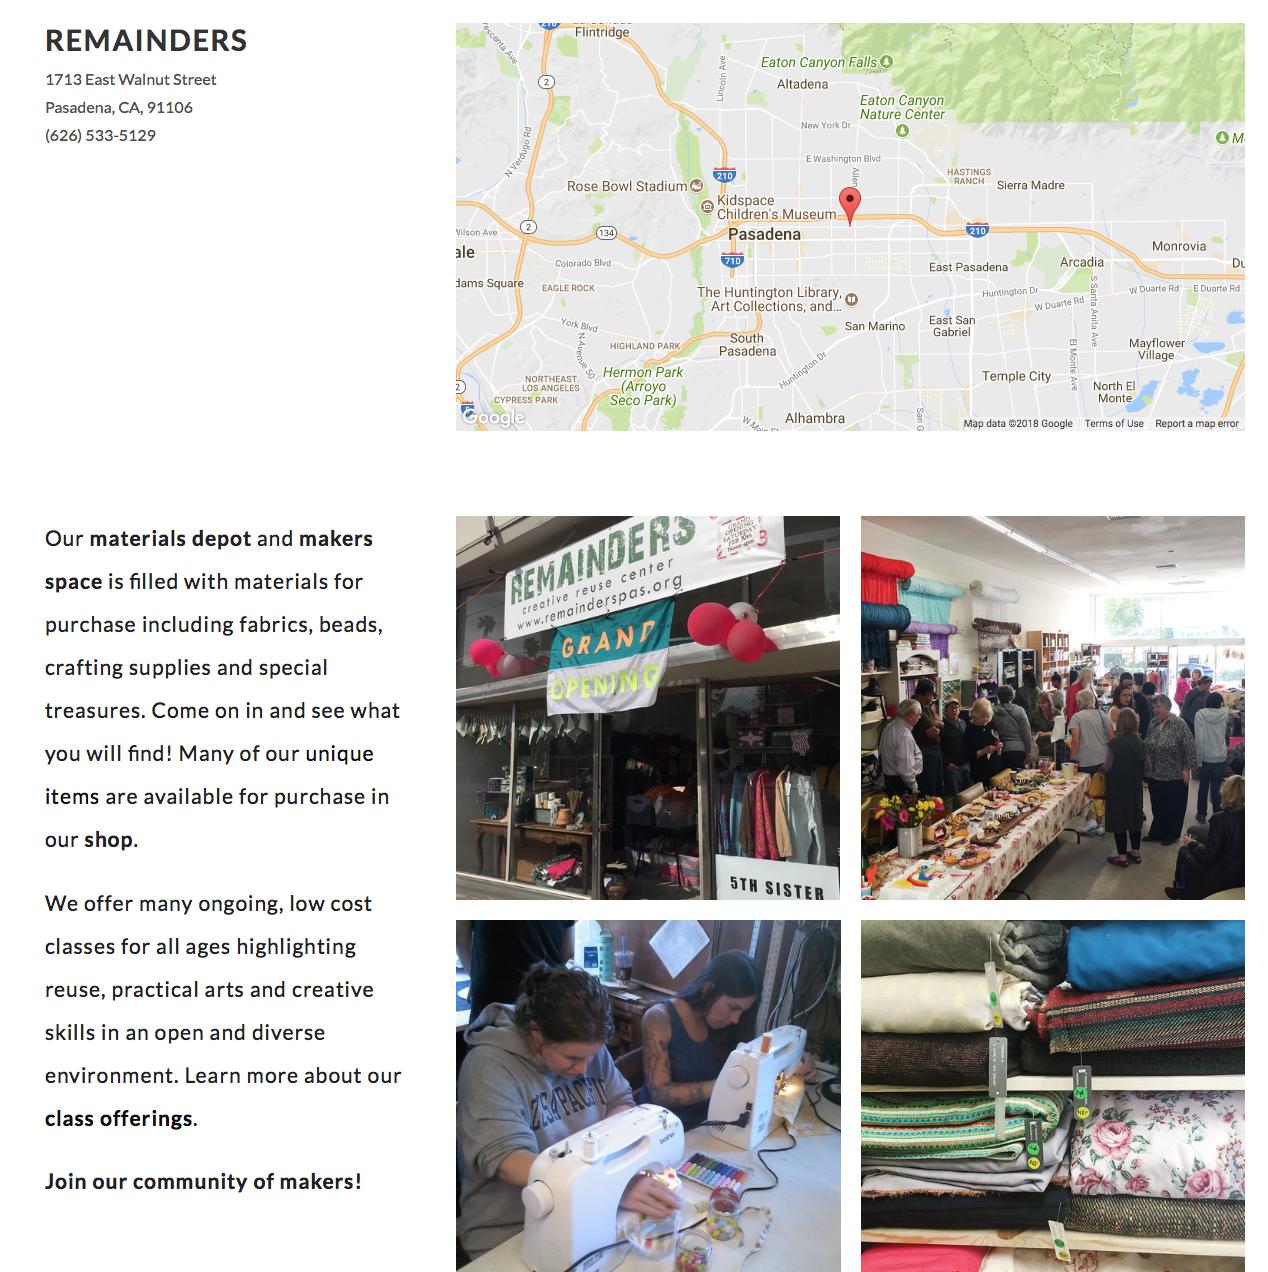 Remainders_1.png